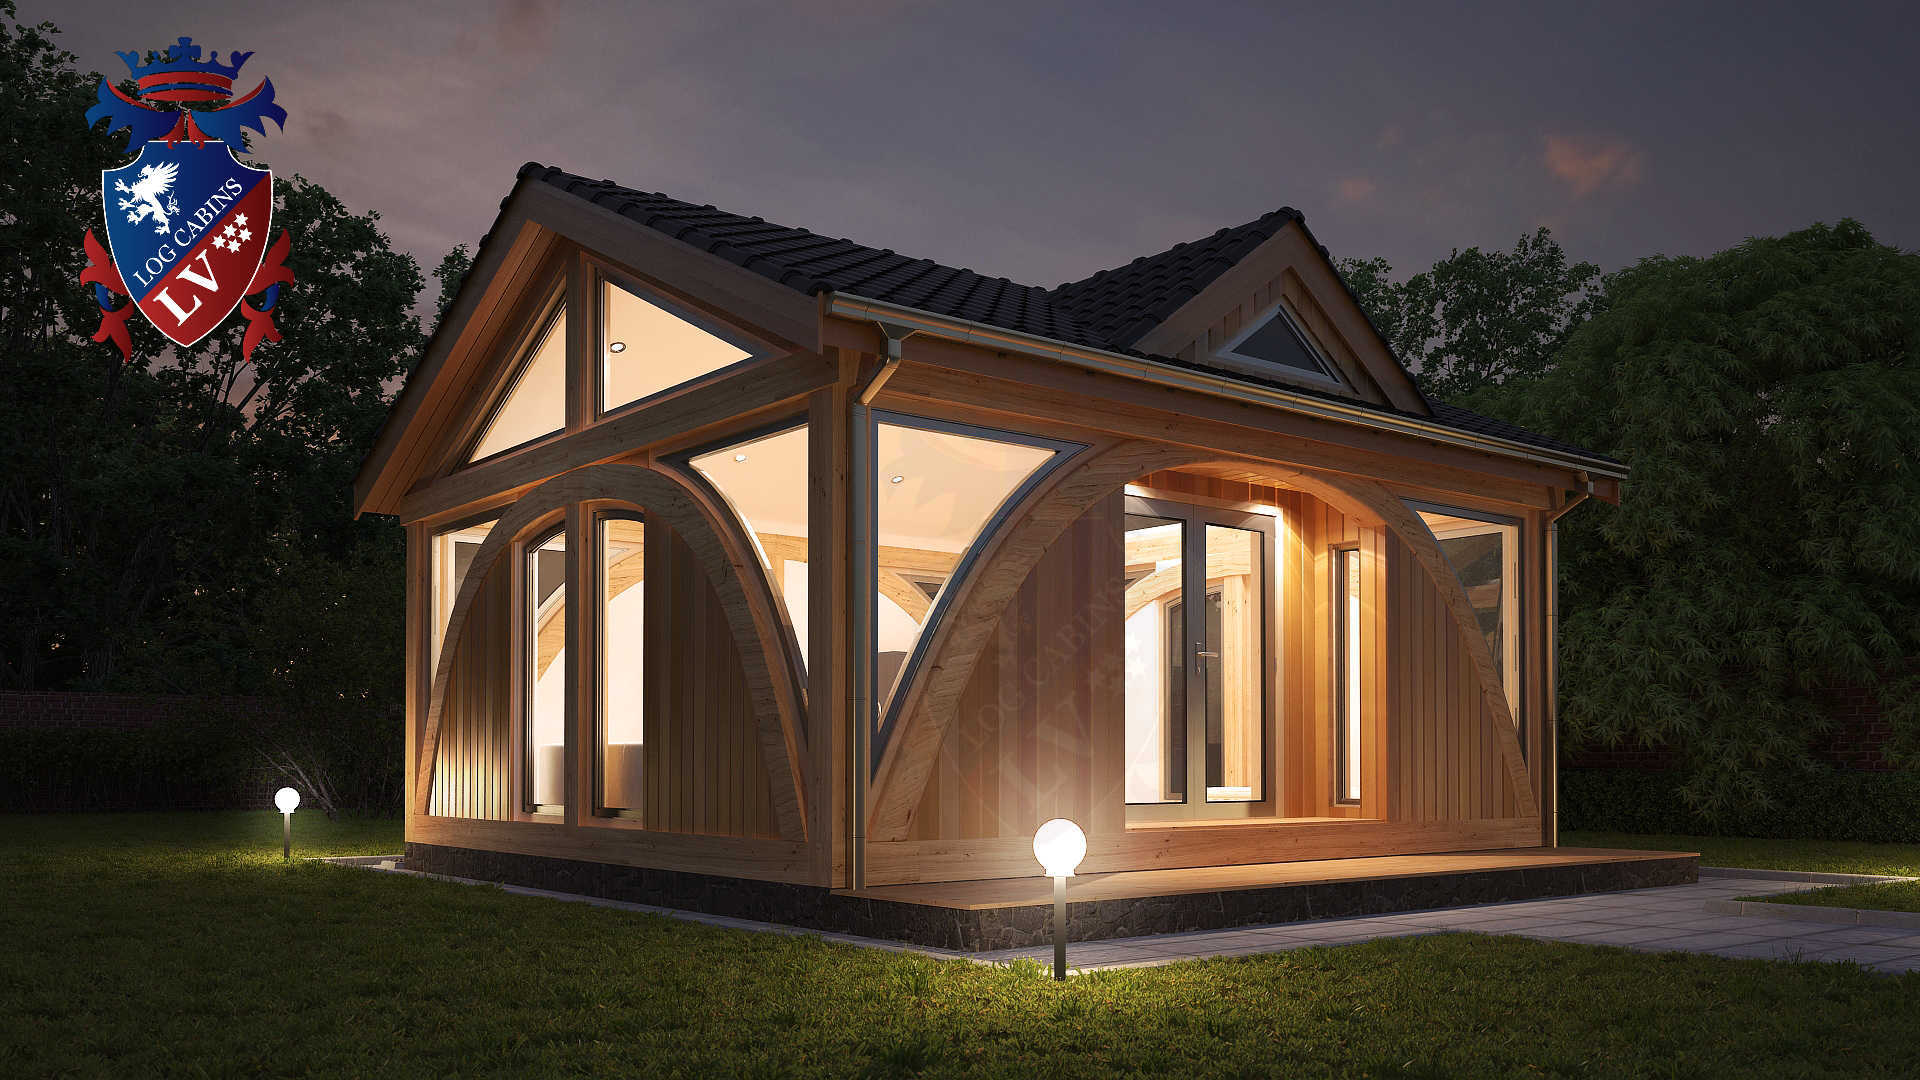 log cabins-cabins-logcabins